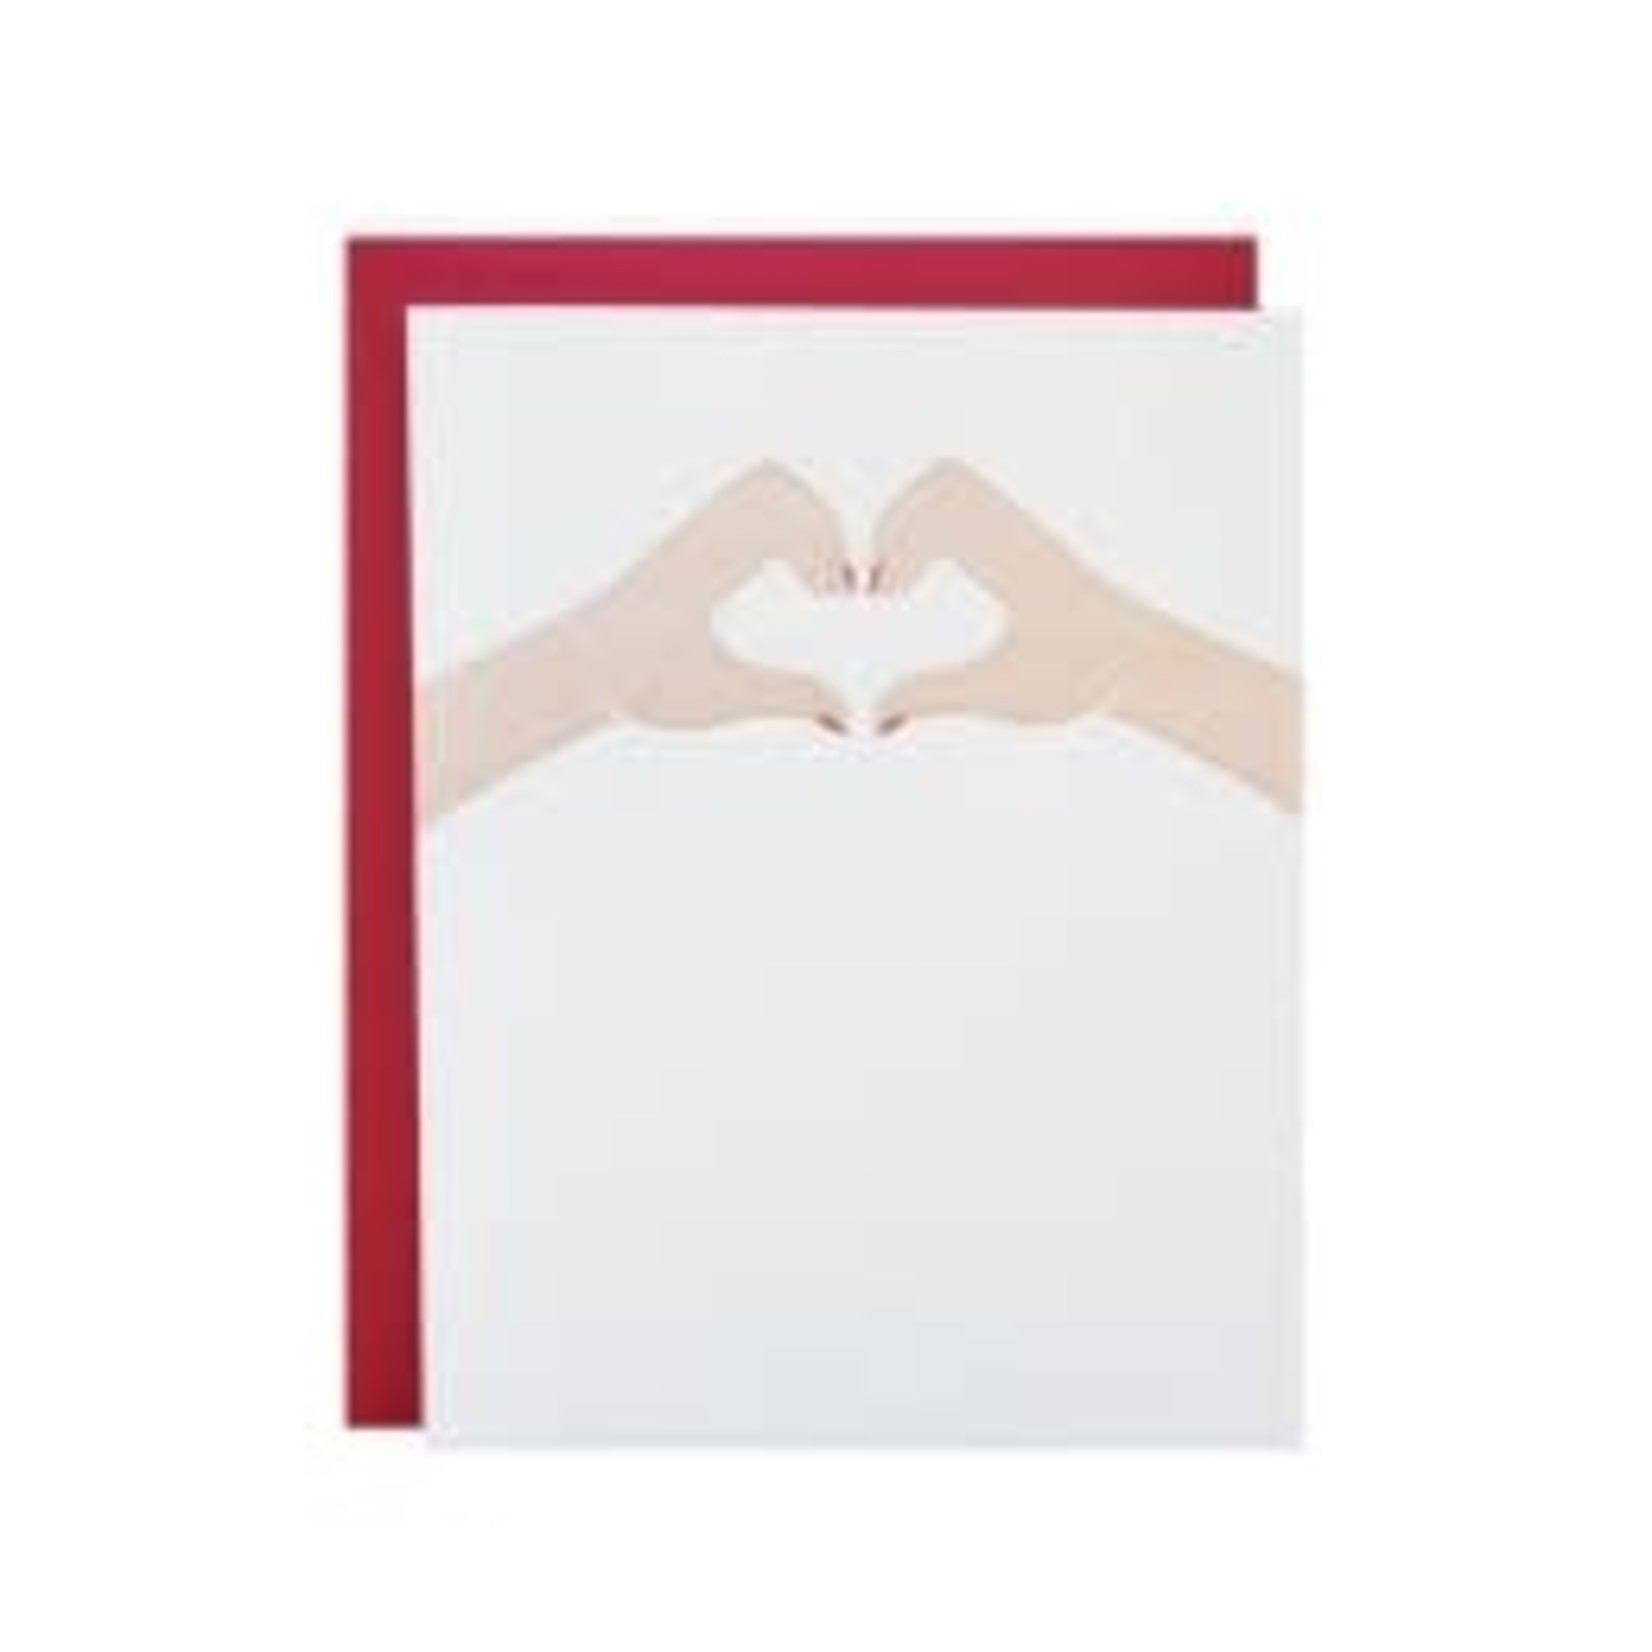 Riva Letterpress Heart Hands